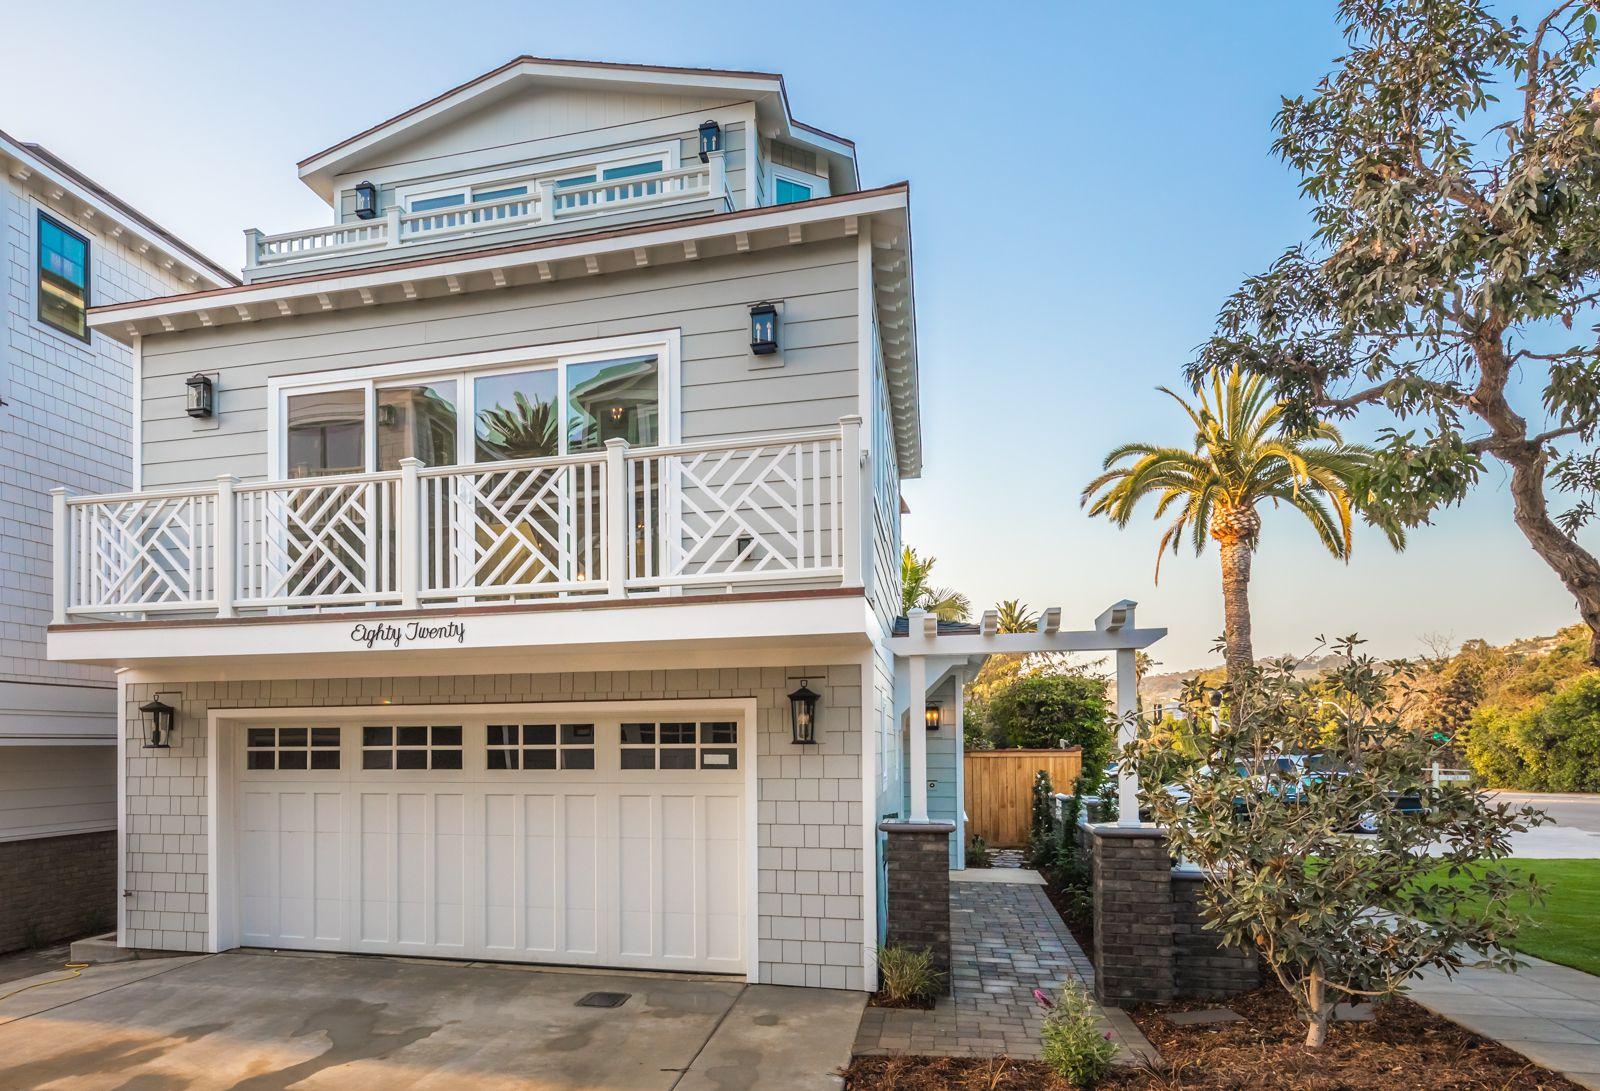 Main Photo: Residential for sale : 2 bedrooms : 8020 La Jolla Shores Drive in La Jolla